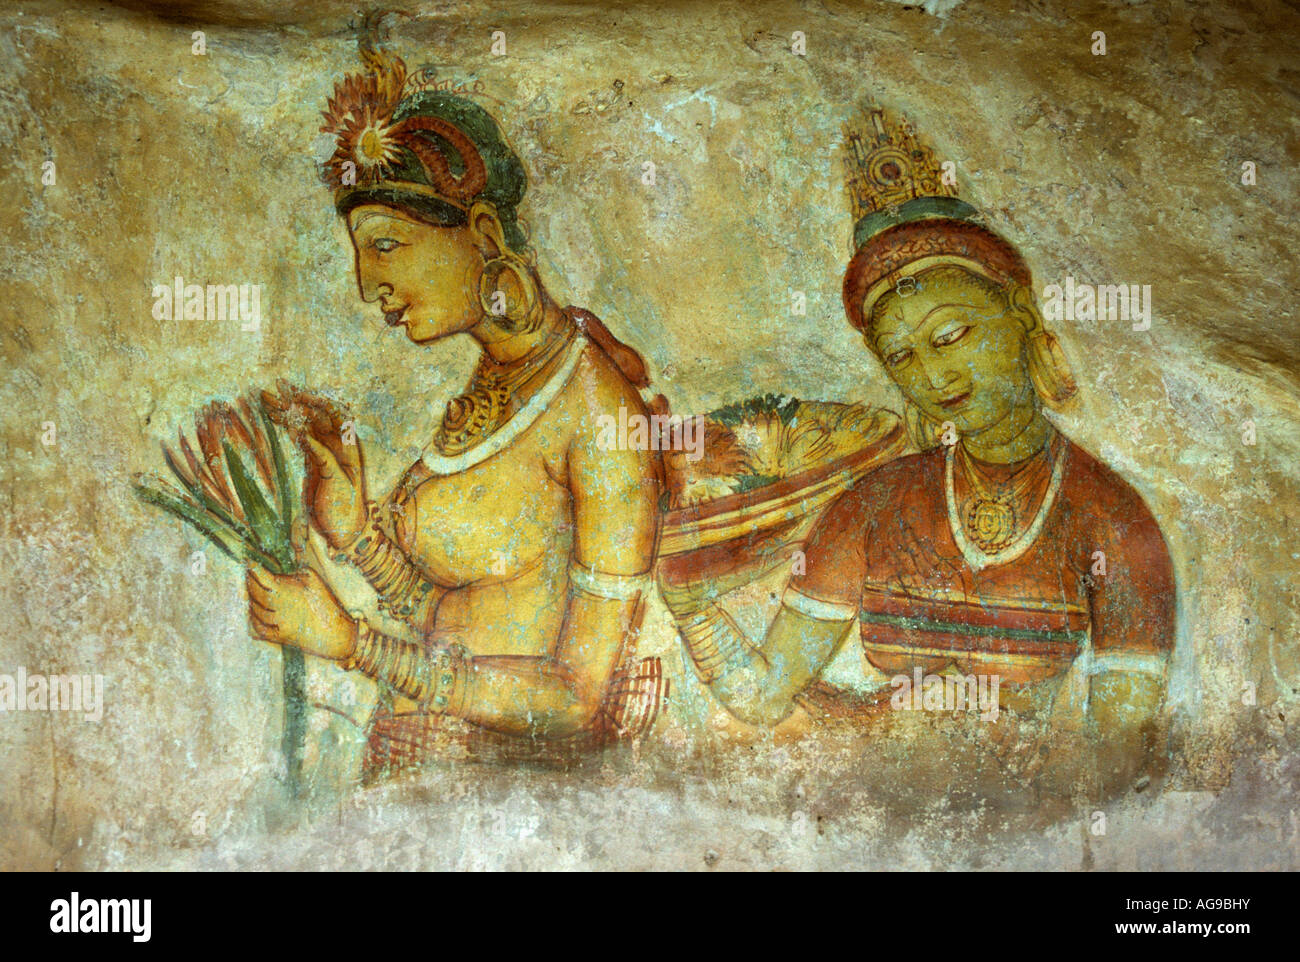 Sri Lanka Sigiriya Wandmalerei oder unter freiem Himmel Stockbild